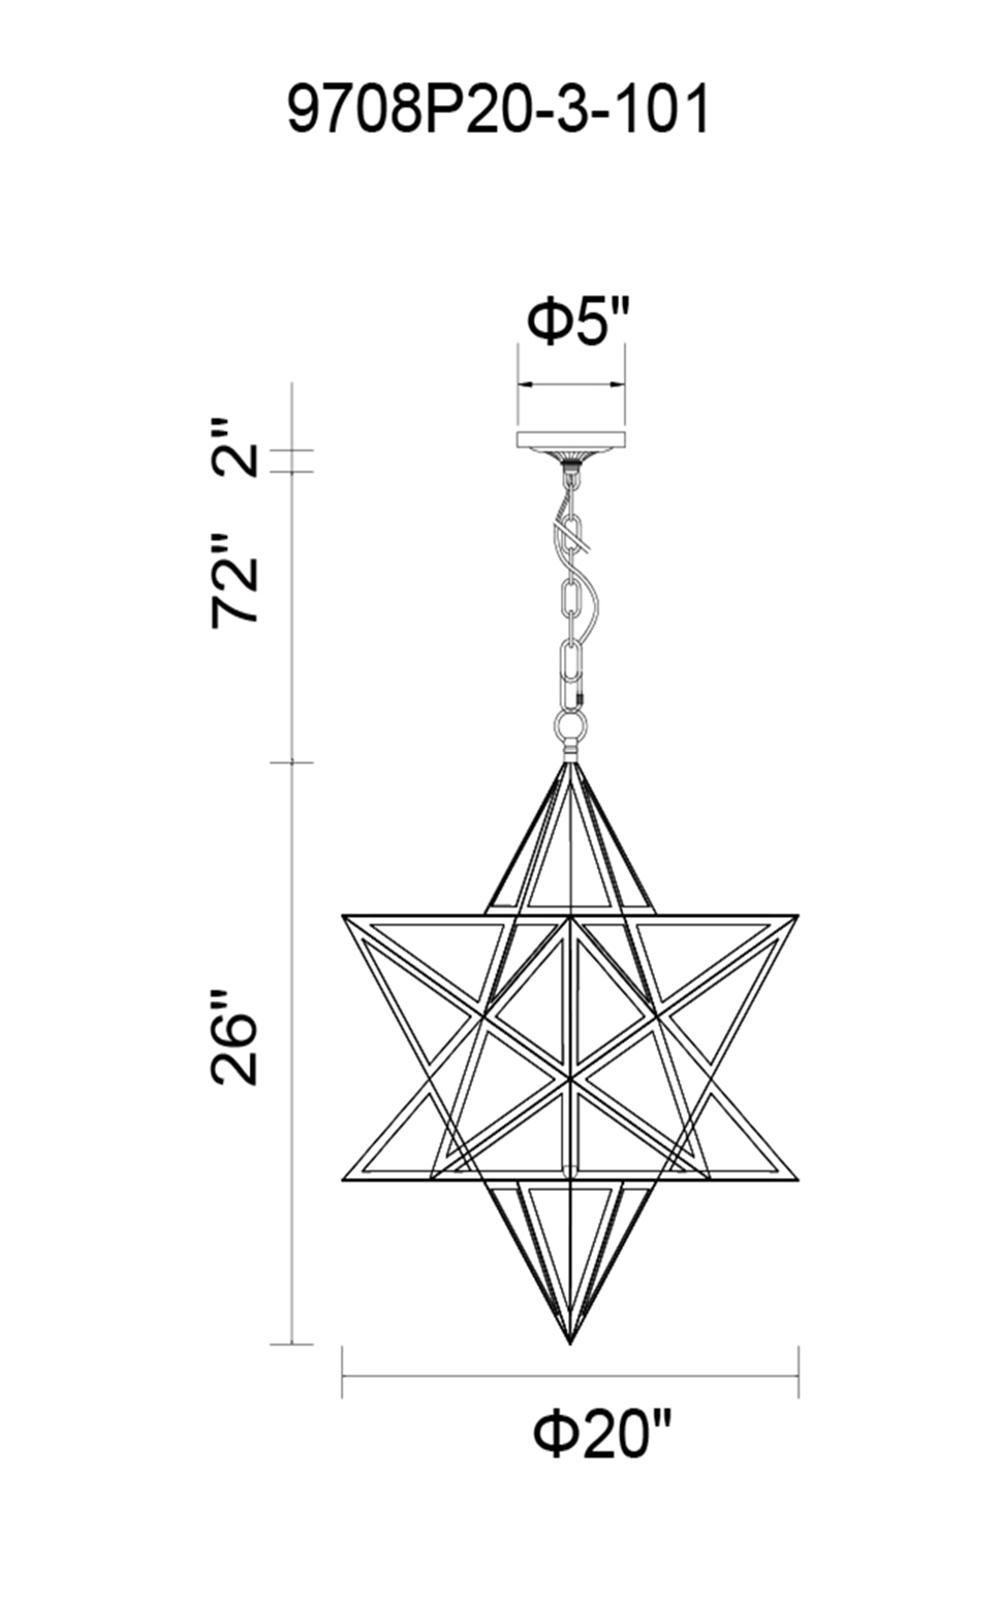 CWI Lighting Astoria 3 Light Pendant With Black Finish Model: 9708P20-3-101 Line Drawing